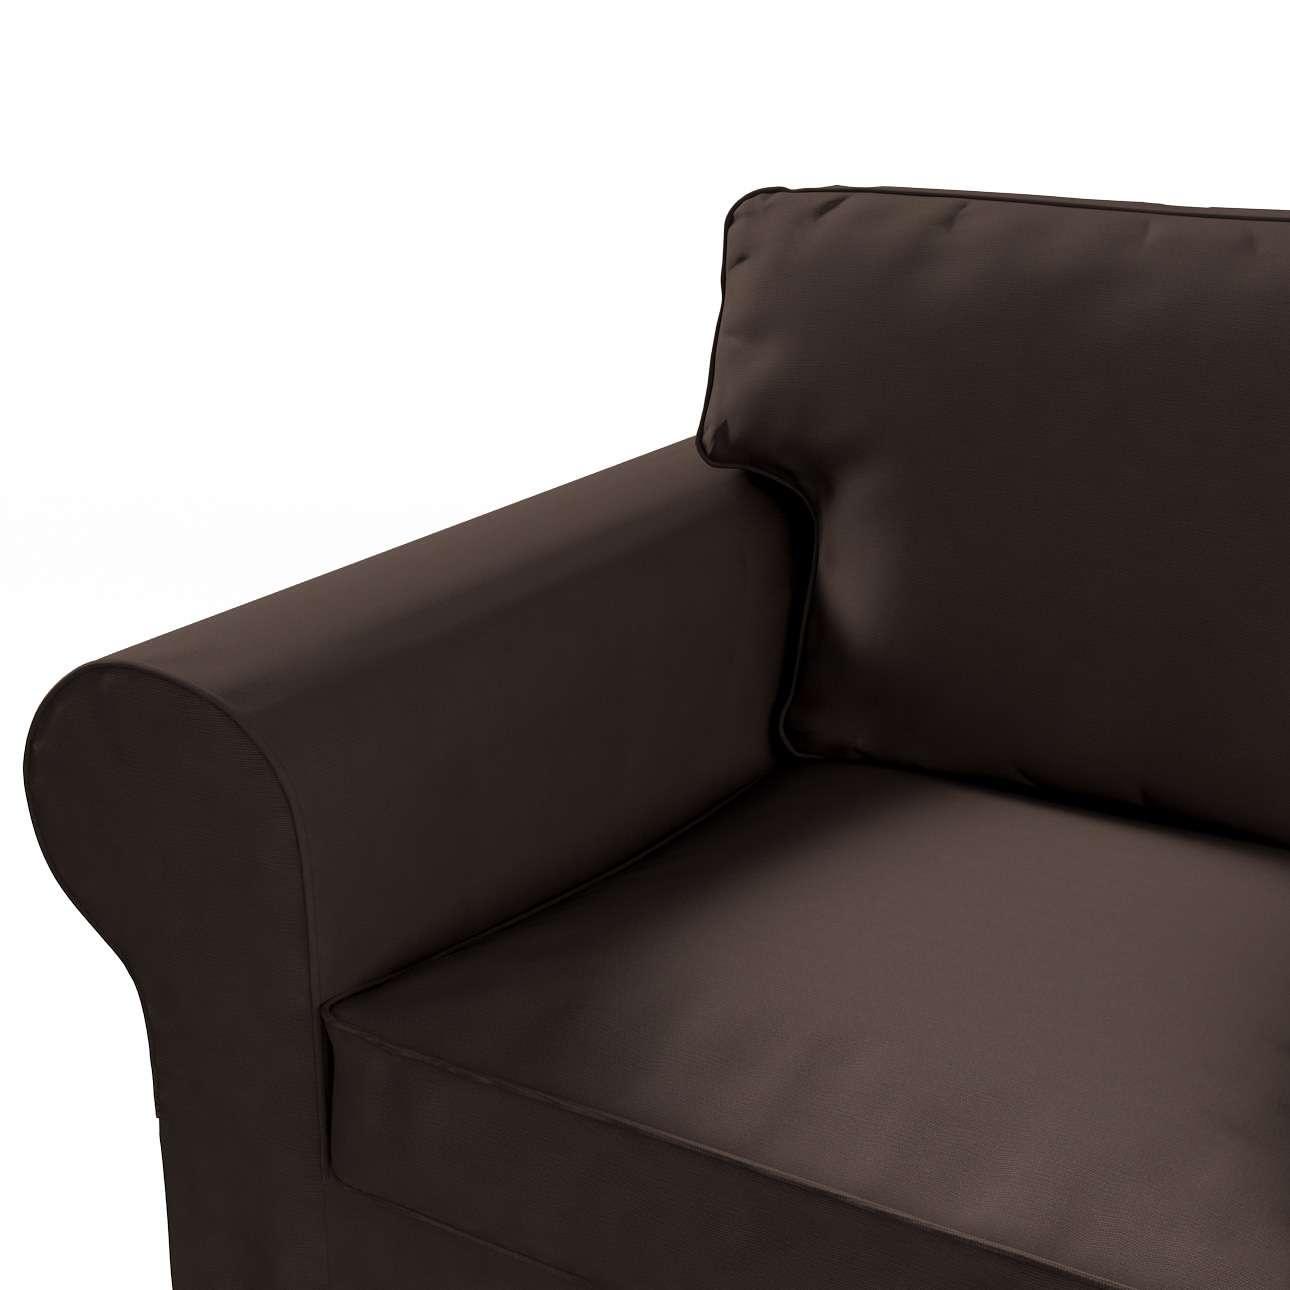 Ektorp 3-Sitzer Schlafsofabezug neues Modell (2013) Ektorp 3-Sitzer, ausklappbar, neues Modell ( 2013) von der Kollektion Cotton Panama, Stoff: 702-03